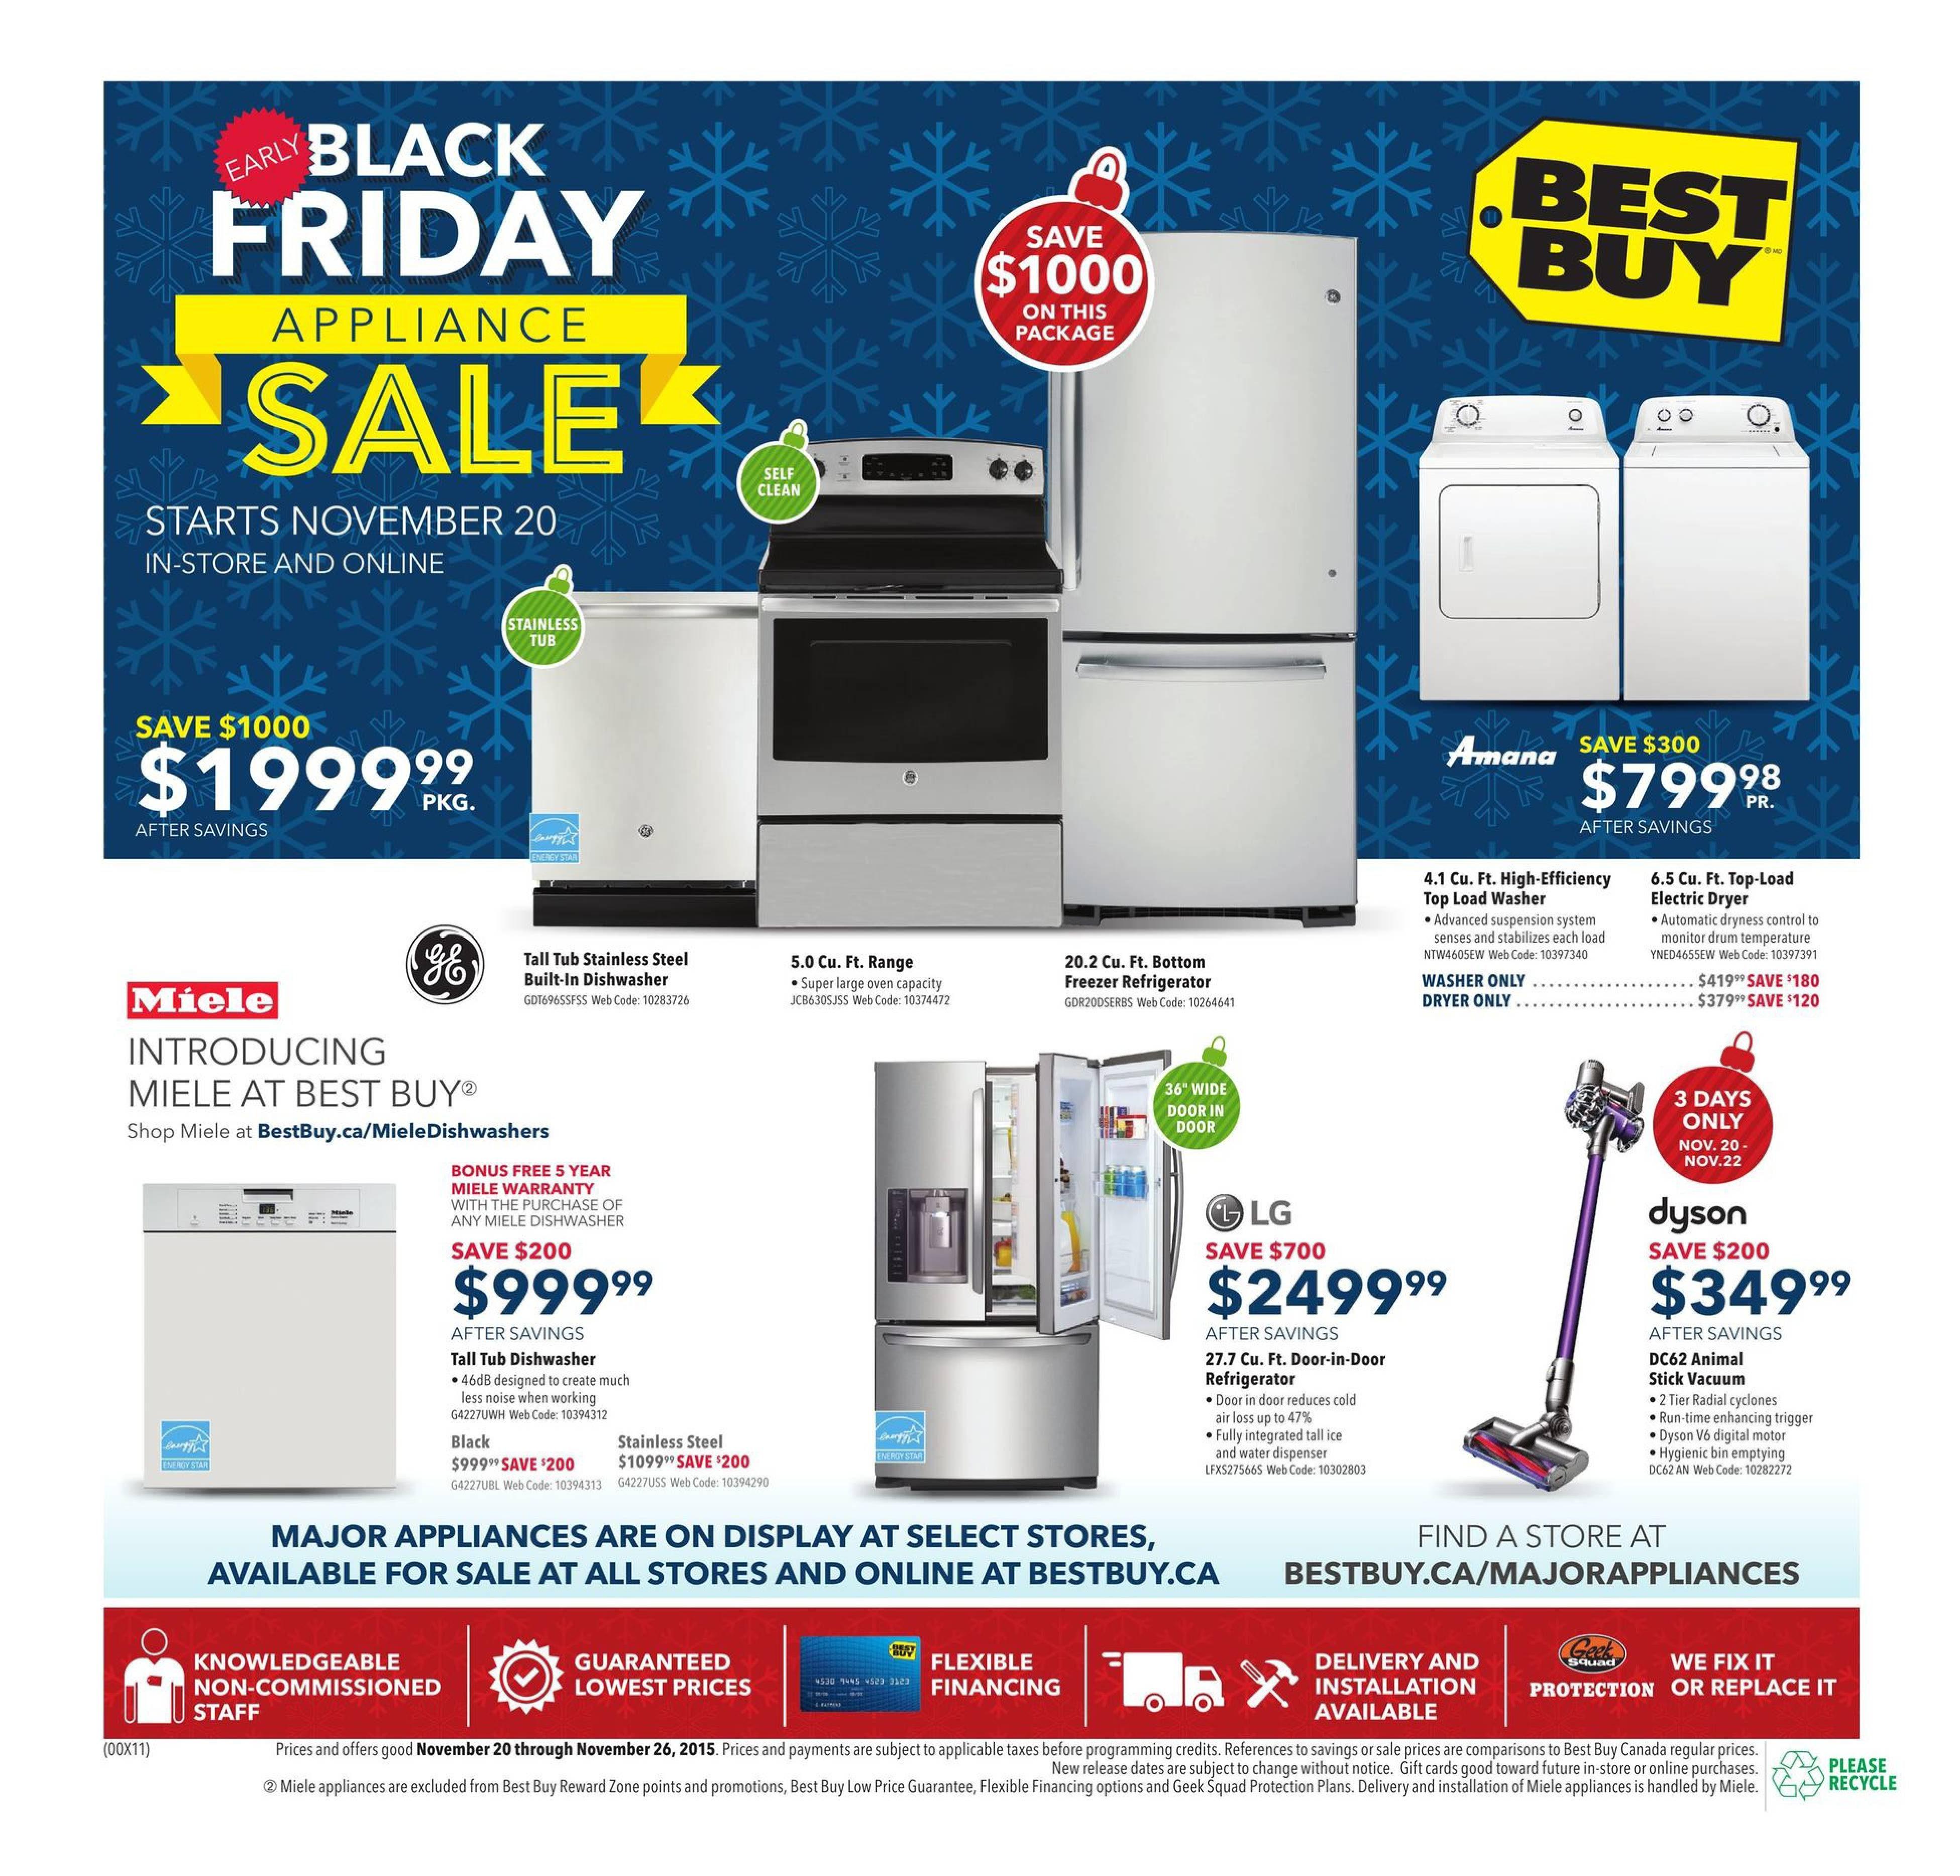 Best buy weekly flyer weekly early black friday appliance sale best buy weekly flyer weekly early black friday appliance sale nov 20 26 redflagdeals fandeluxe Choice Image